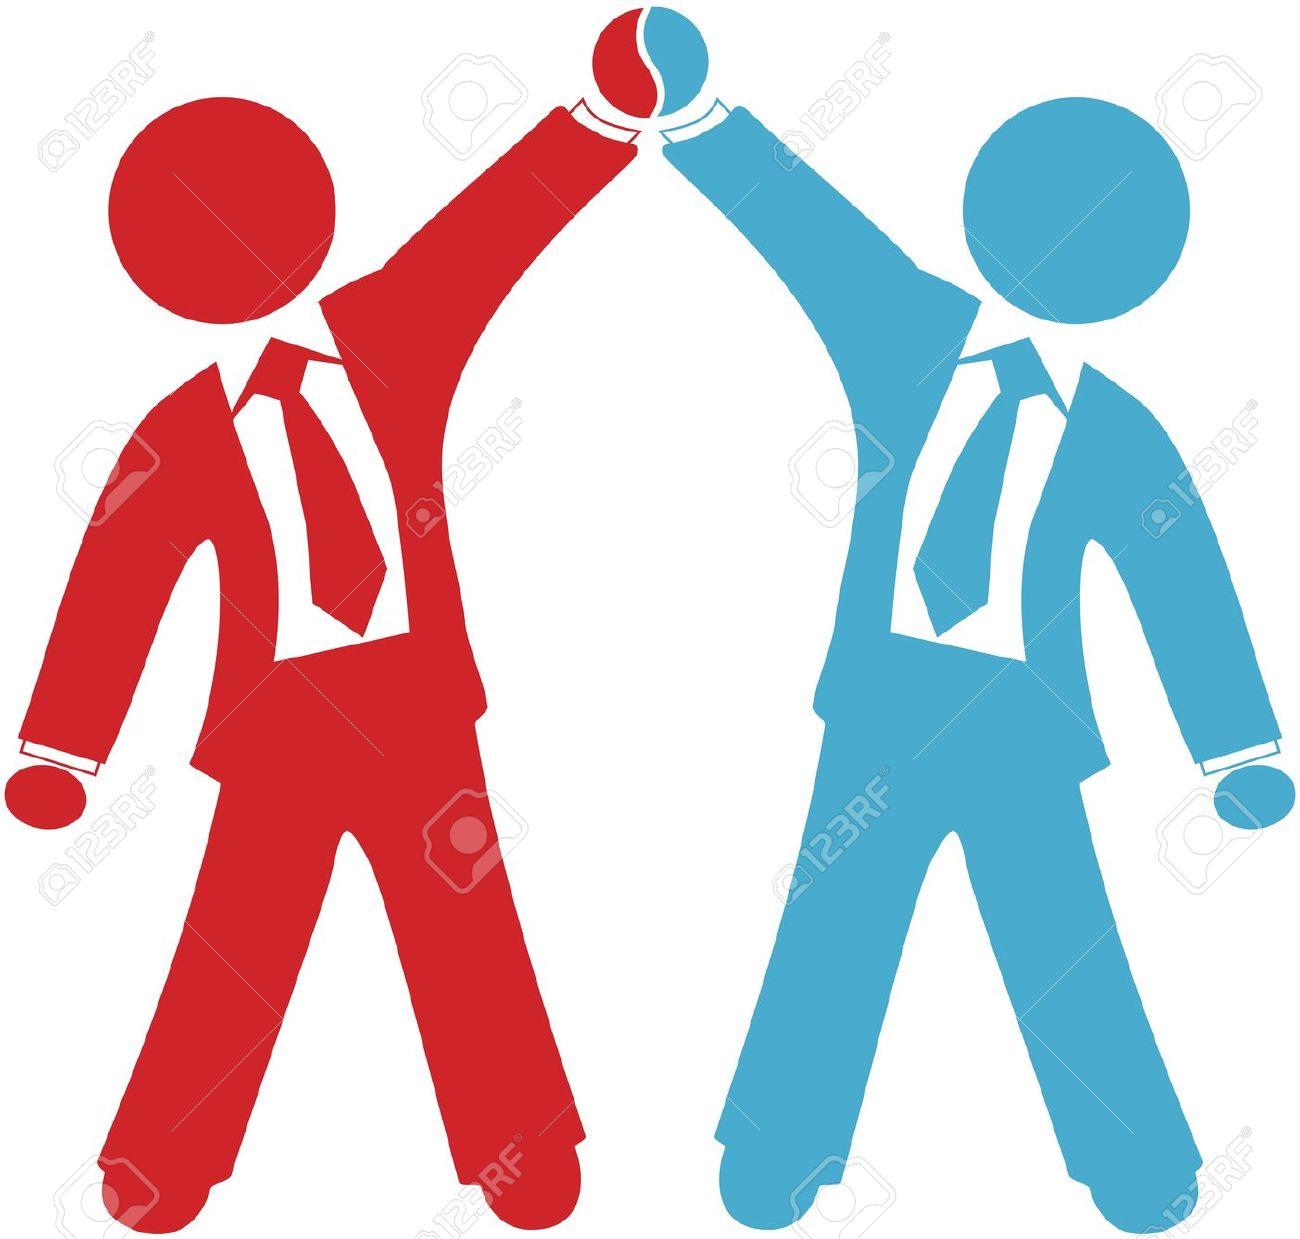 . Business clipart business partner